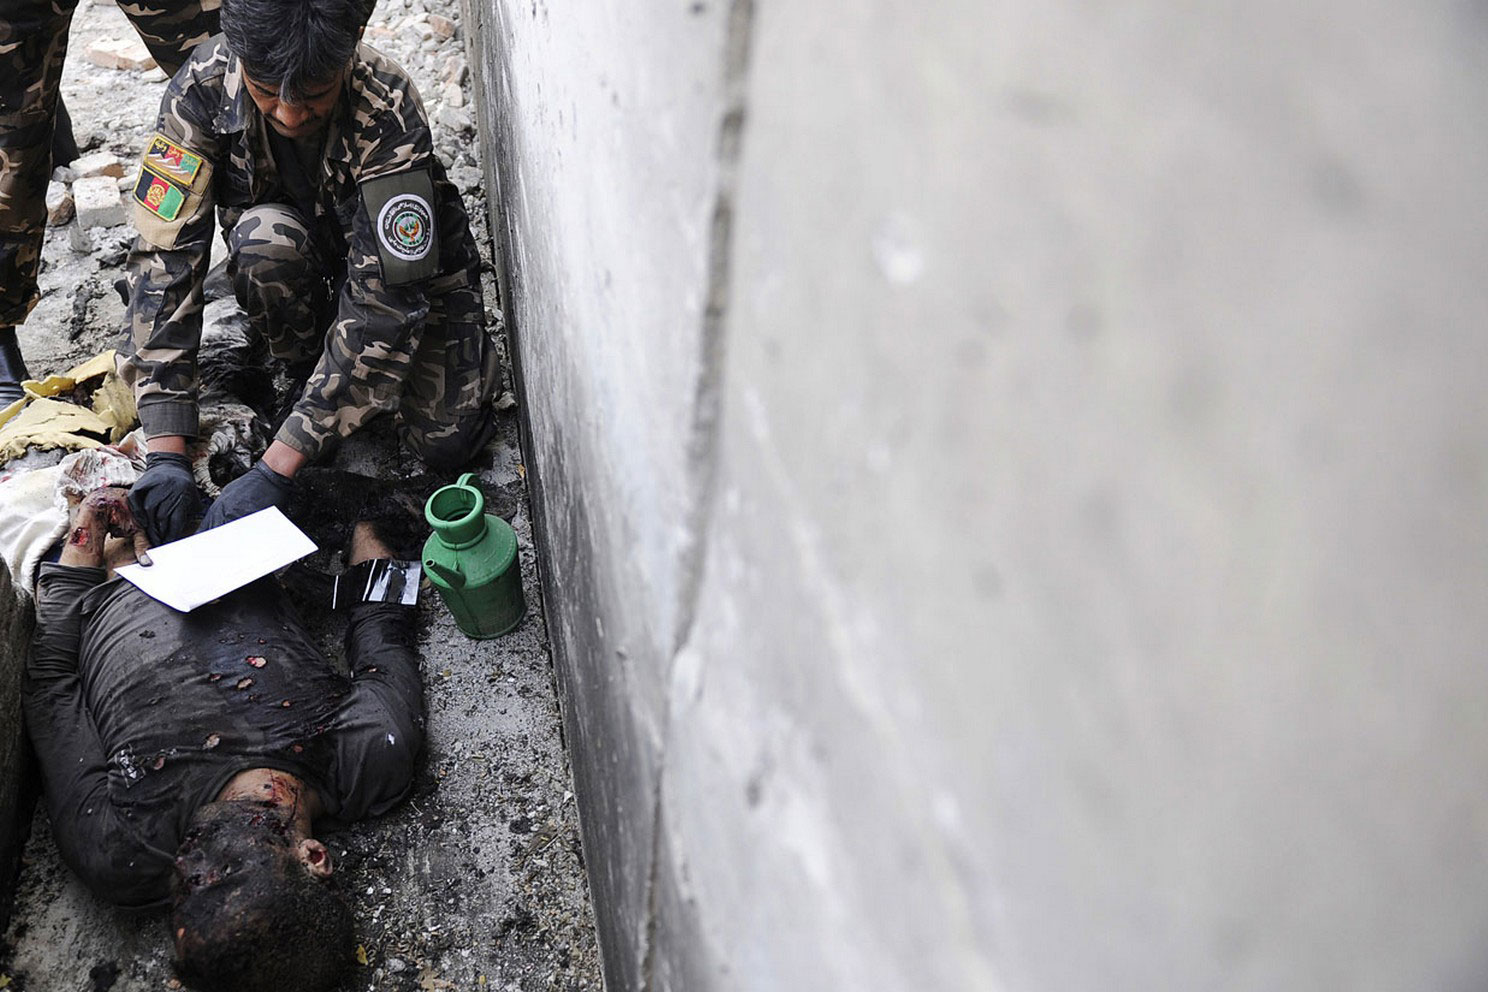 снятие отпечатков пальцев с террориста-смертника в Афганистане